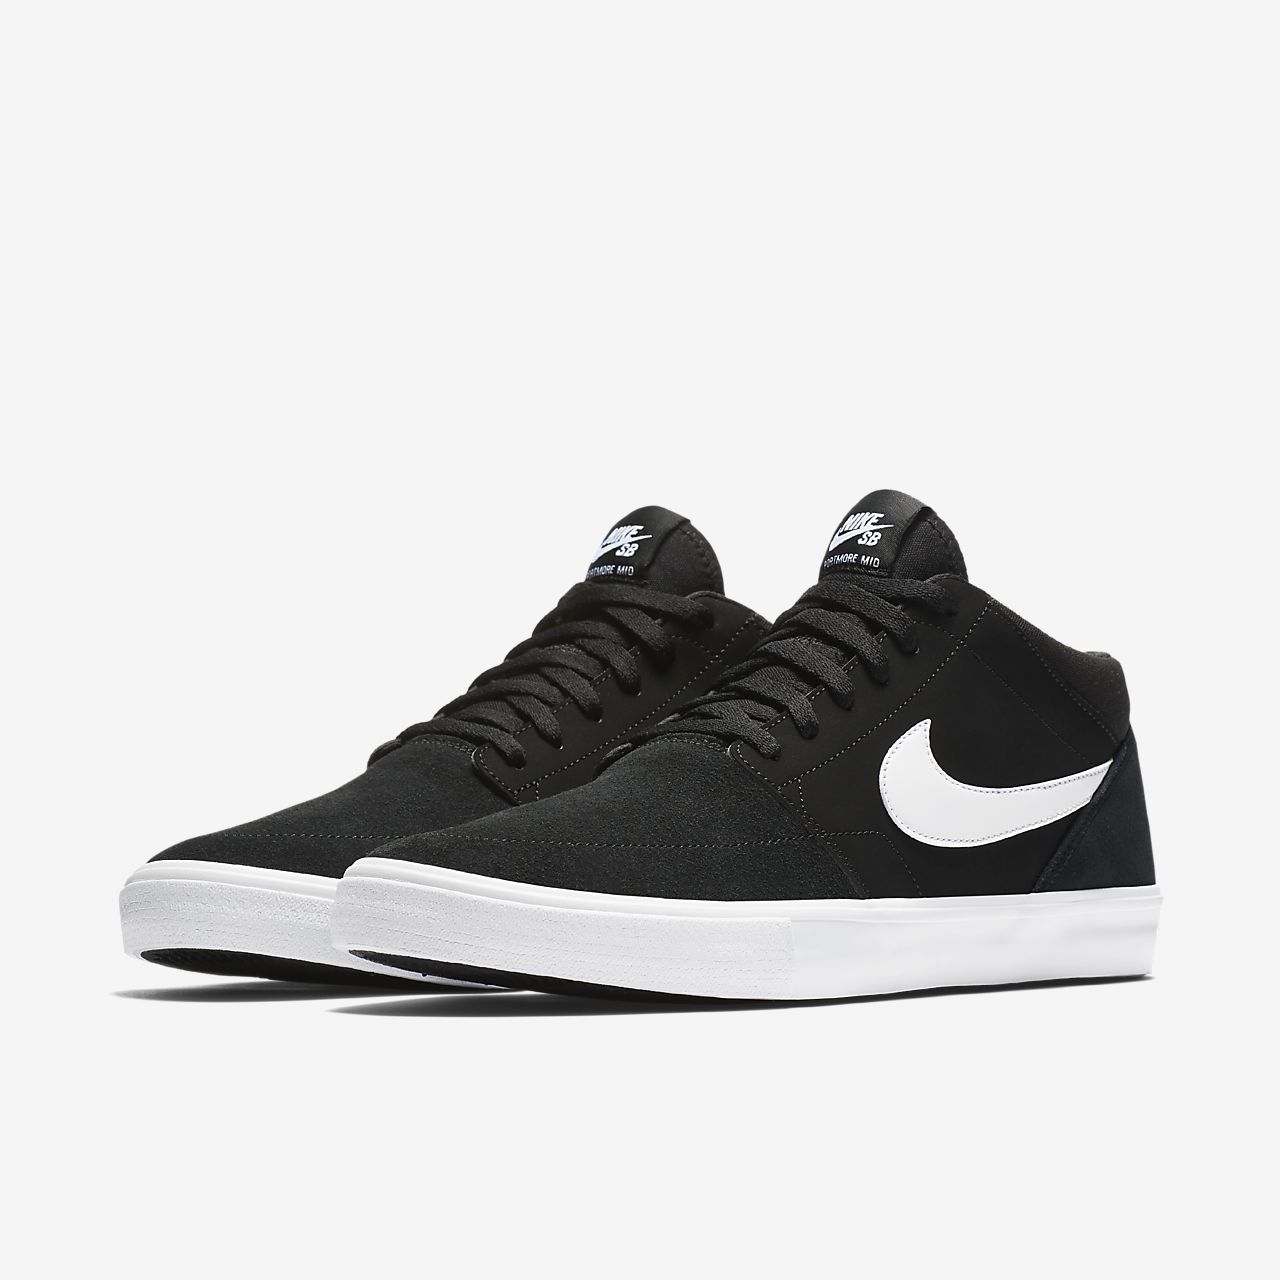 nike skate shoes ... nike sb solarsoft portmore ii mid menu0027s skateboarding shoe UKBWOHZ